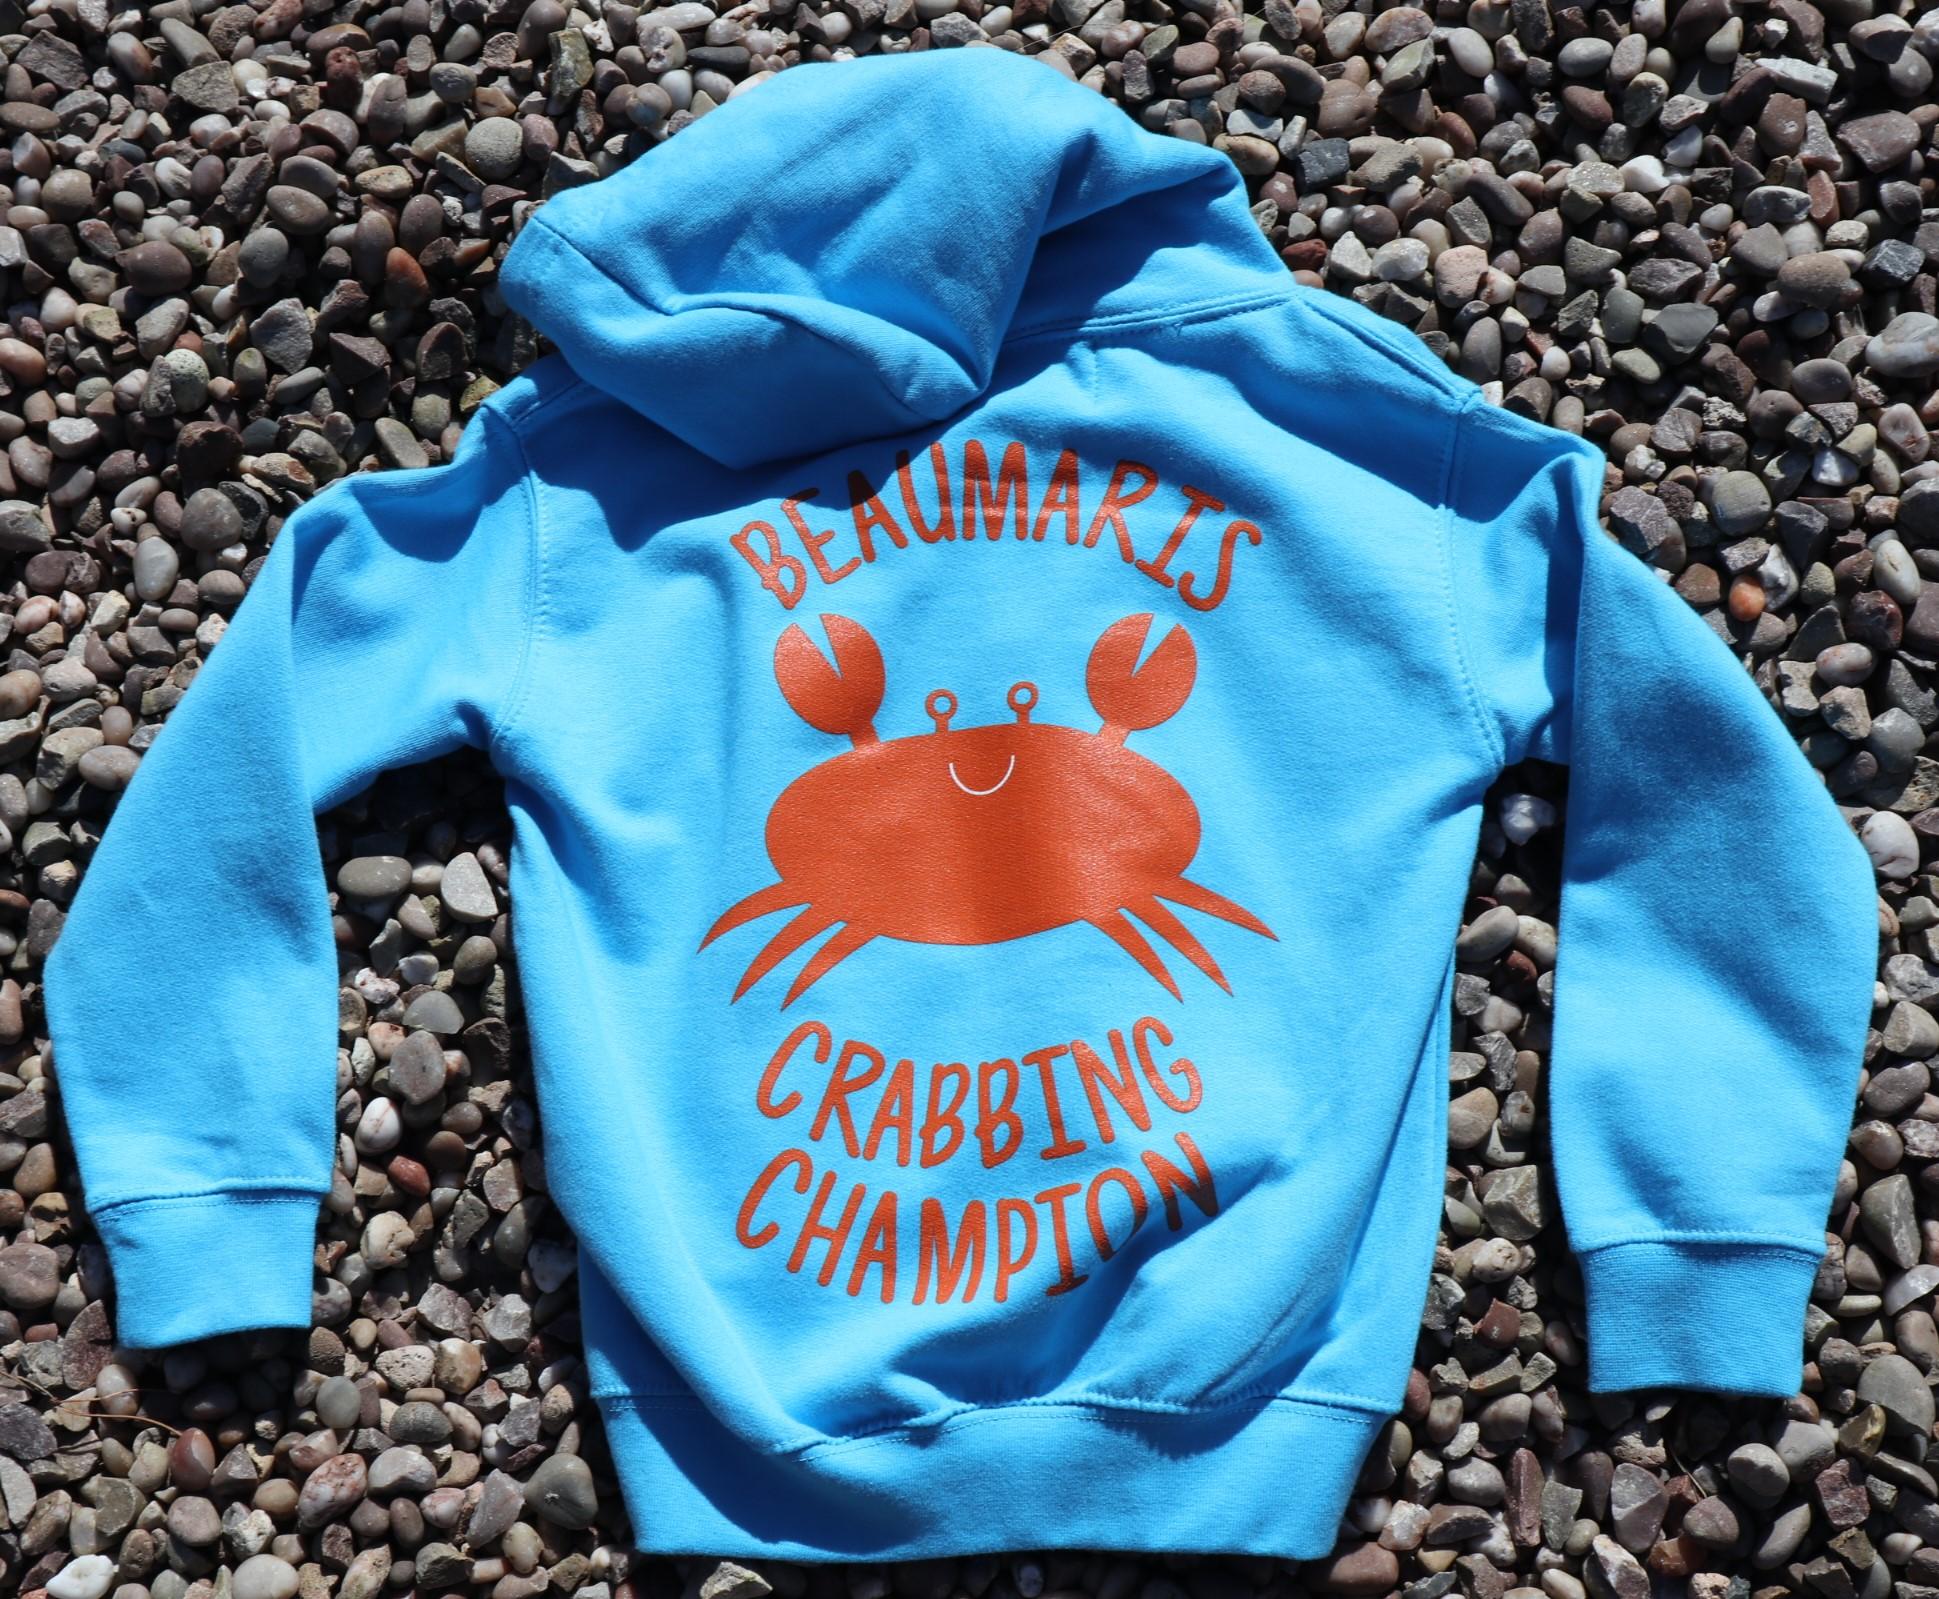 Kids Beaumaris crabbing champion hoody sky